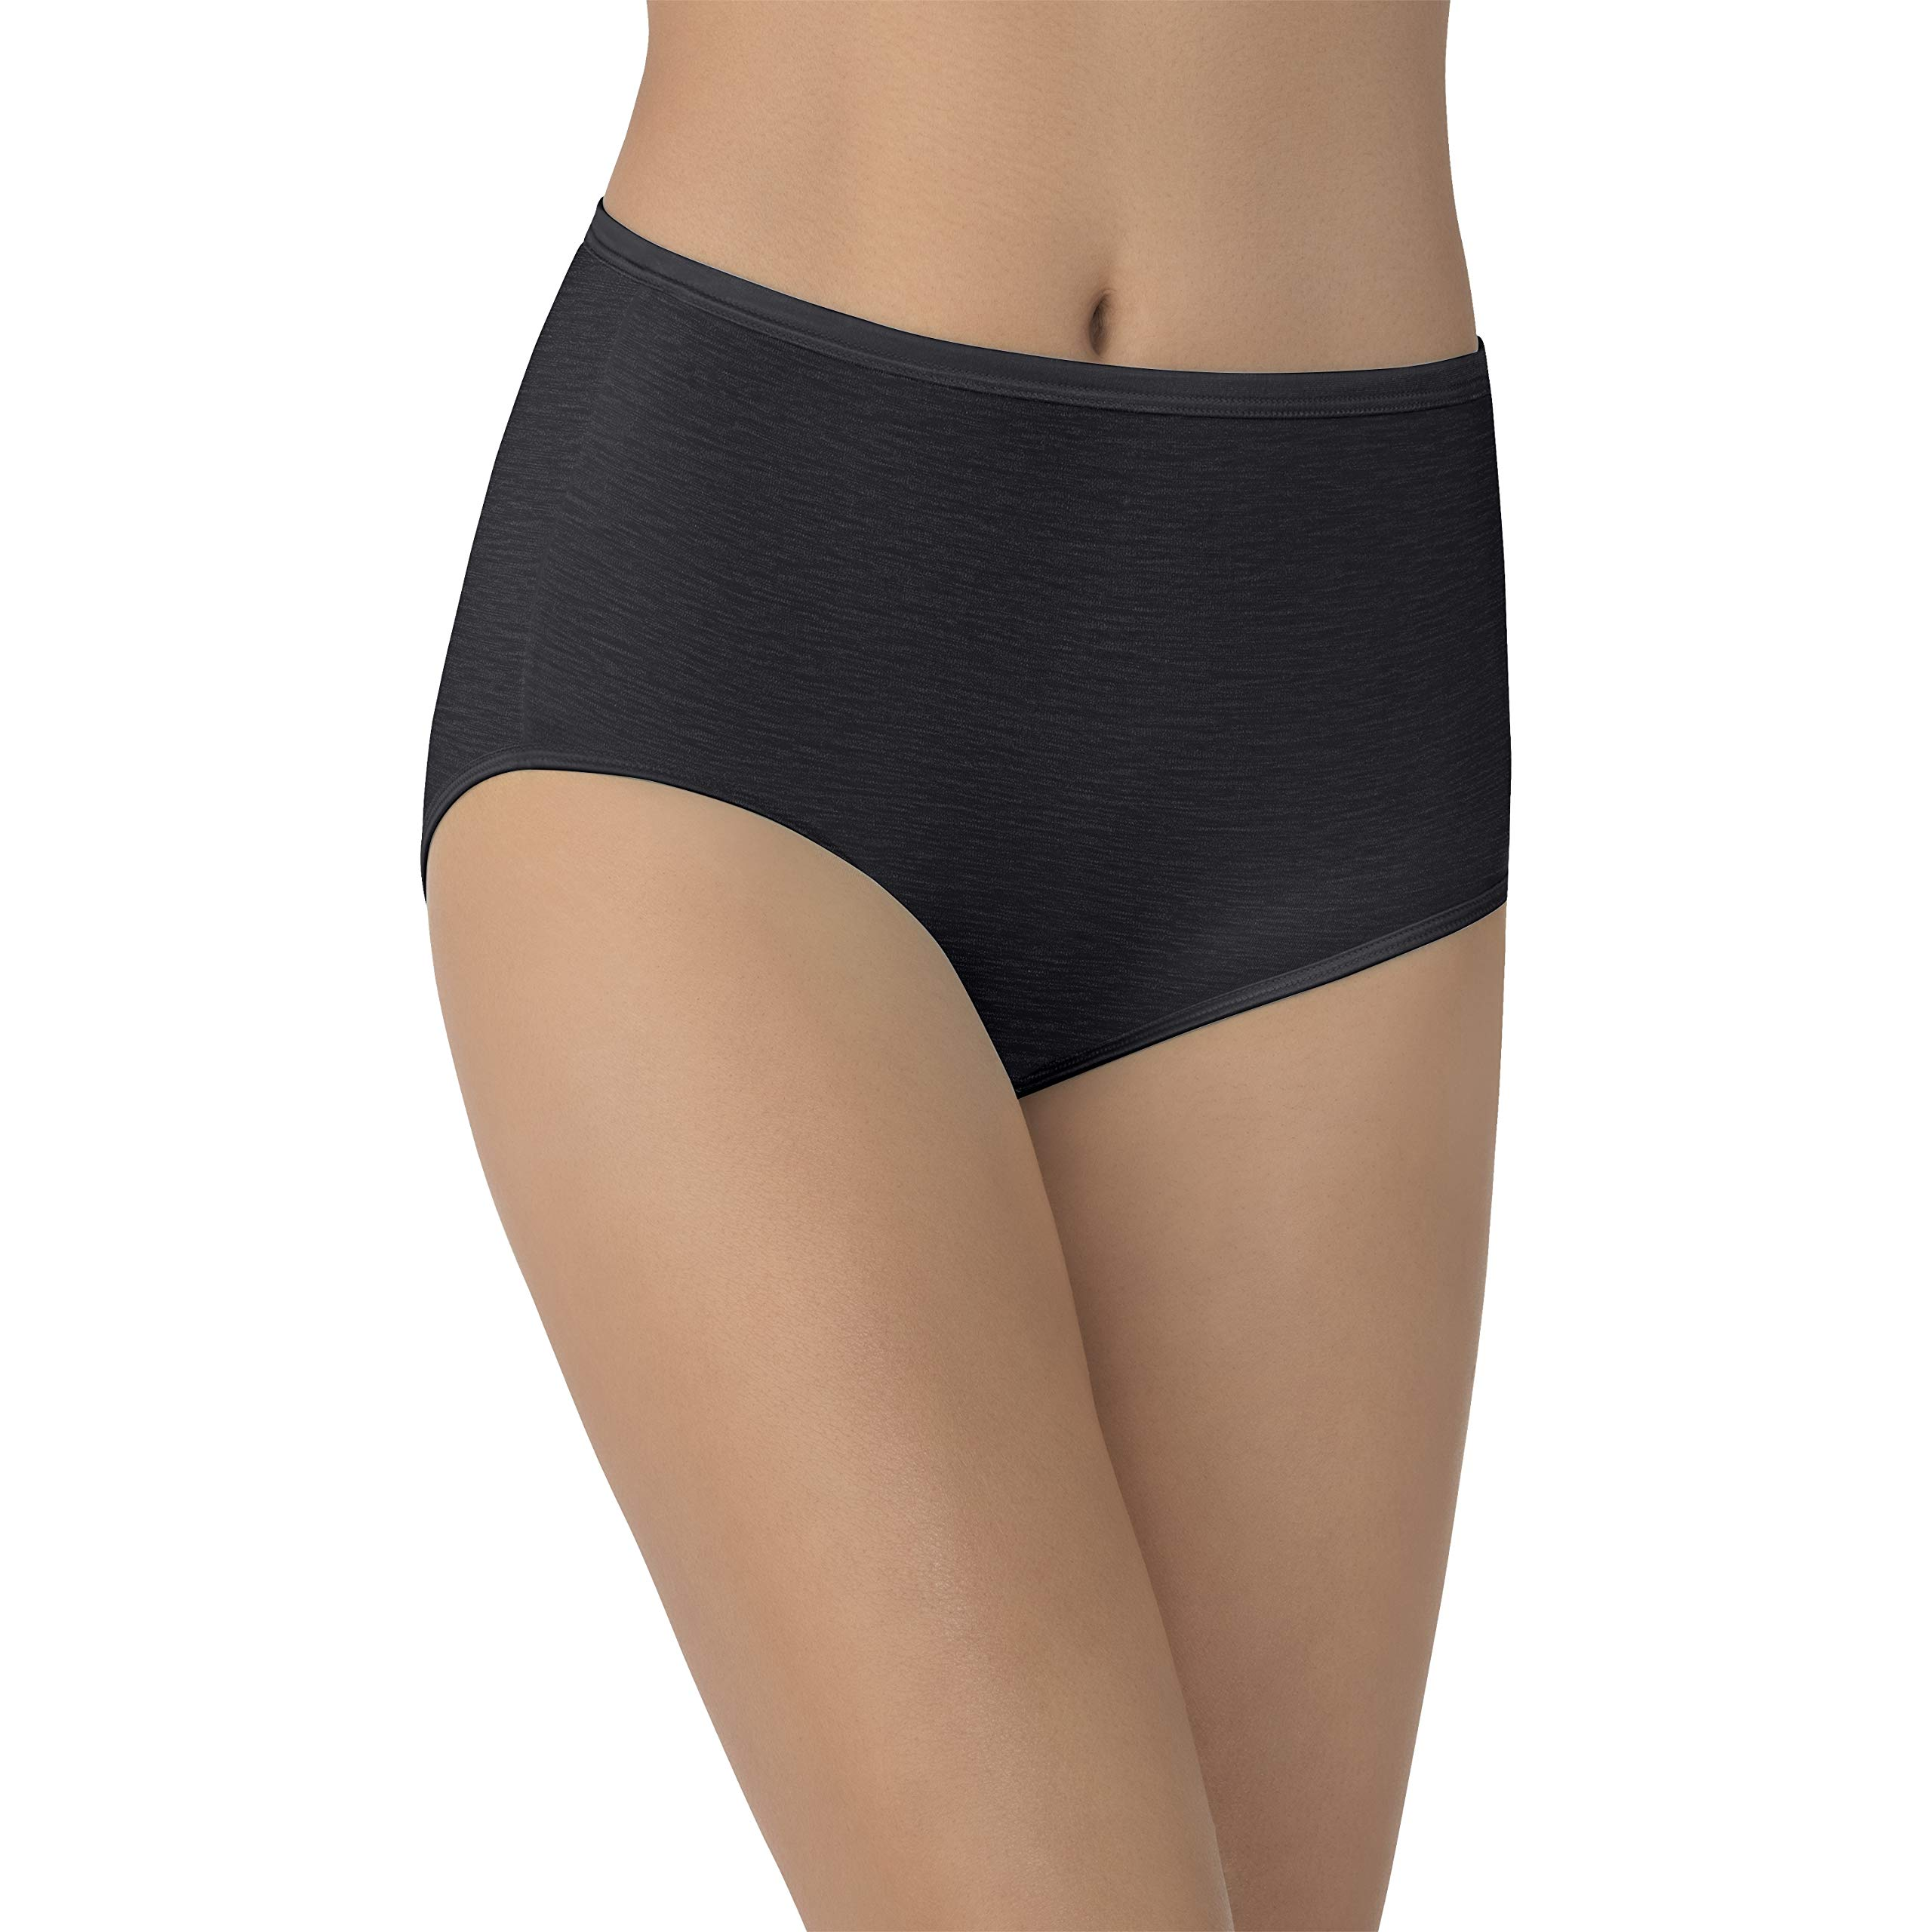 930a242a09f8 Galleon - Vanity Fair Women's My Favorite Pants Illumination Brief #13109,  Midnight Black, Size 7